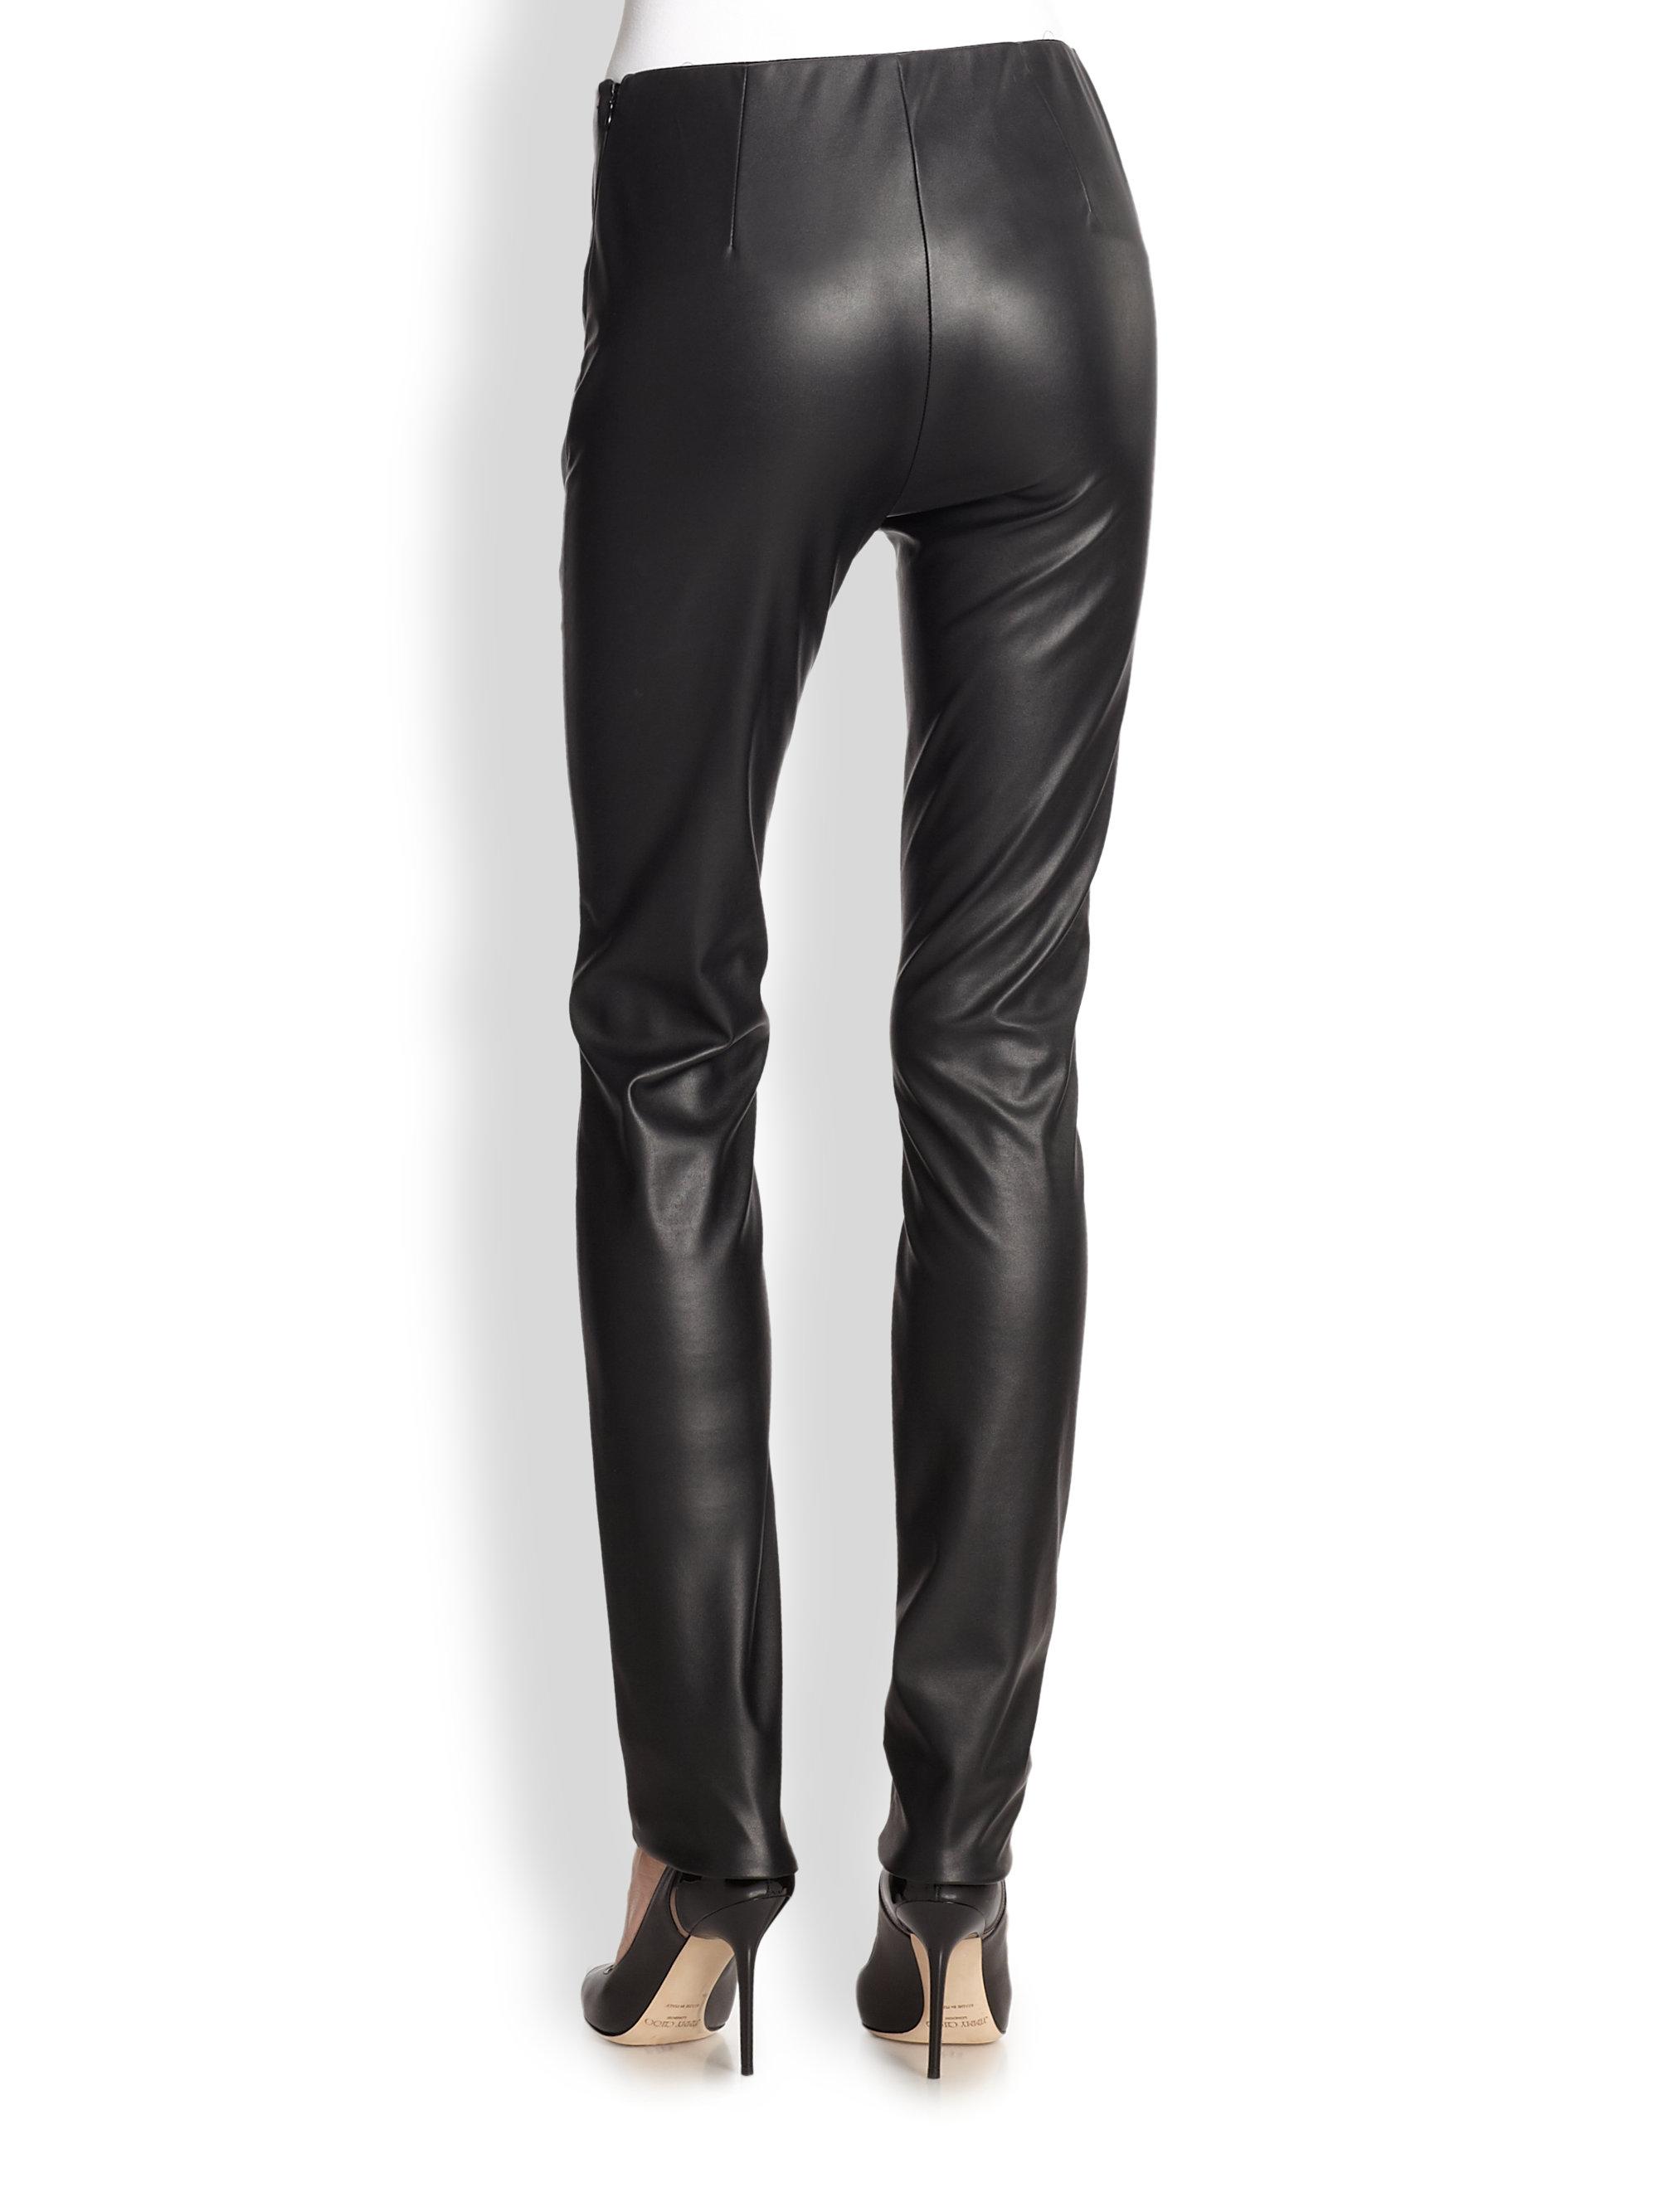 M missoni Leatherette Leggings in Black